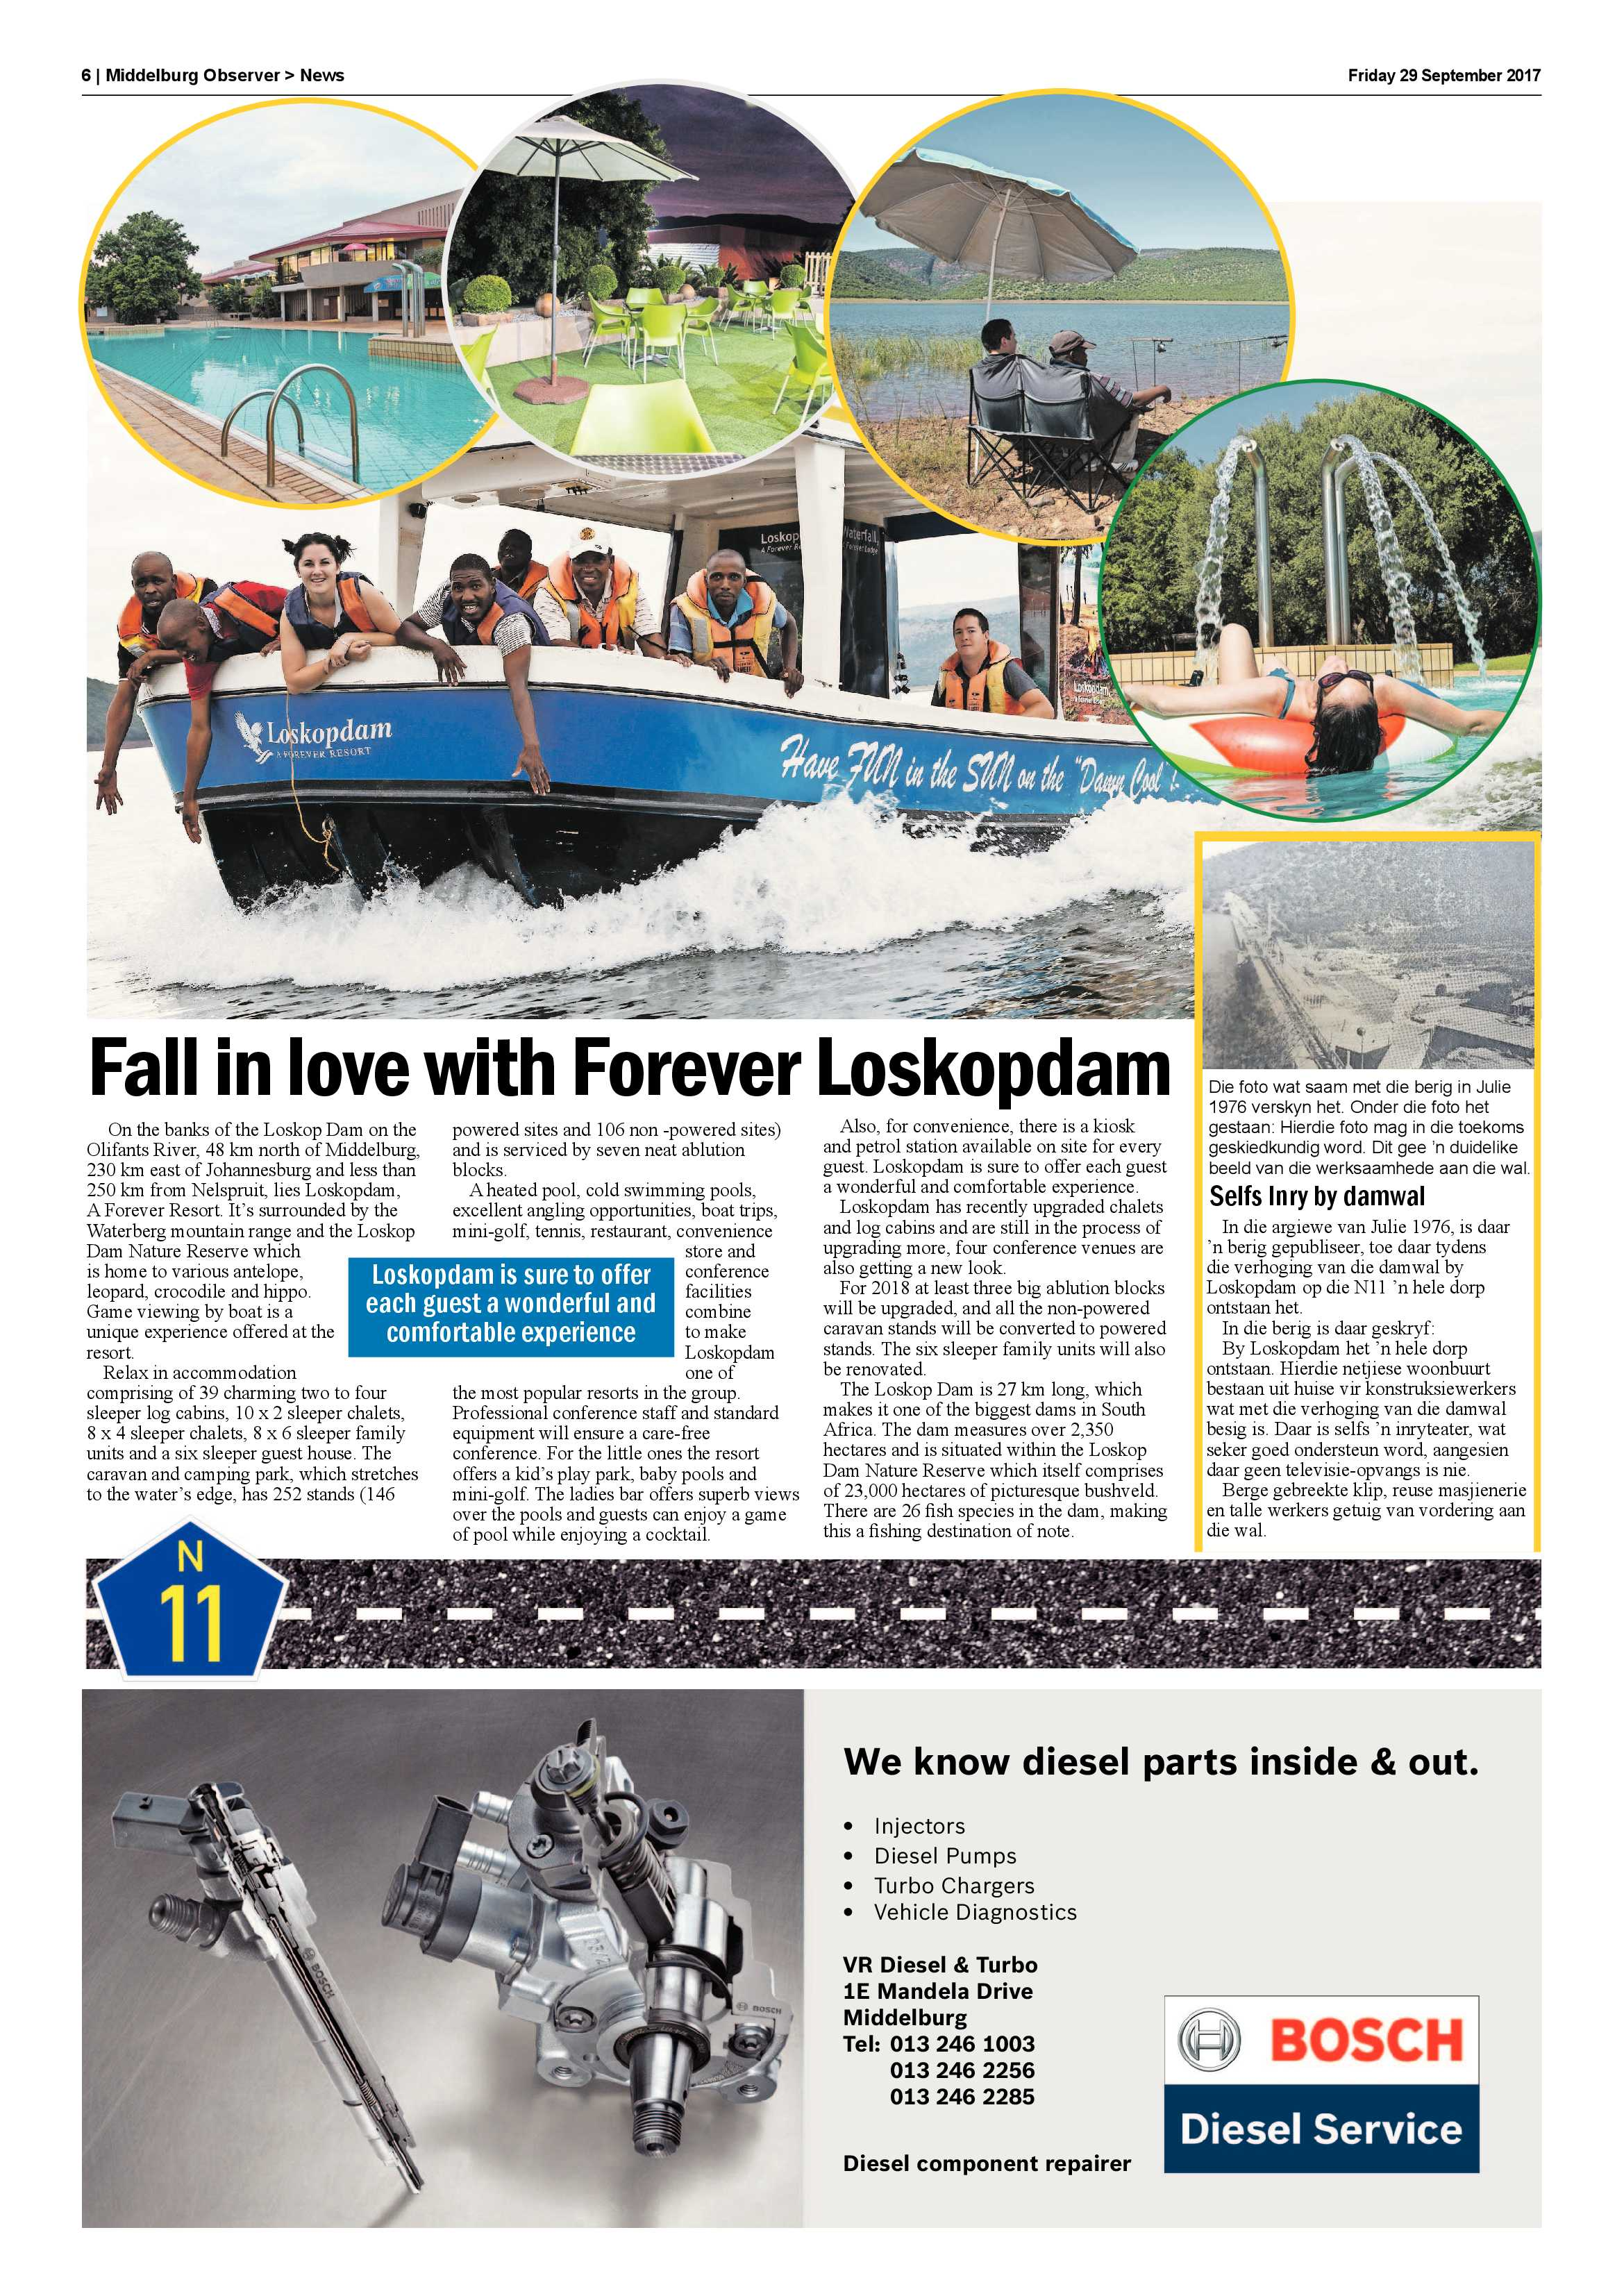 explore-enjoy-new-n11-epapers-page-6